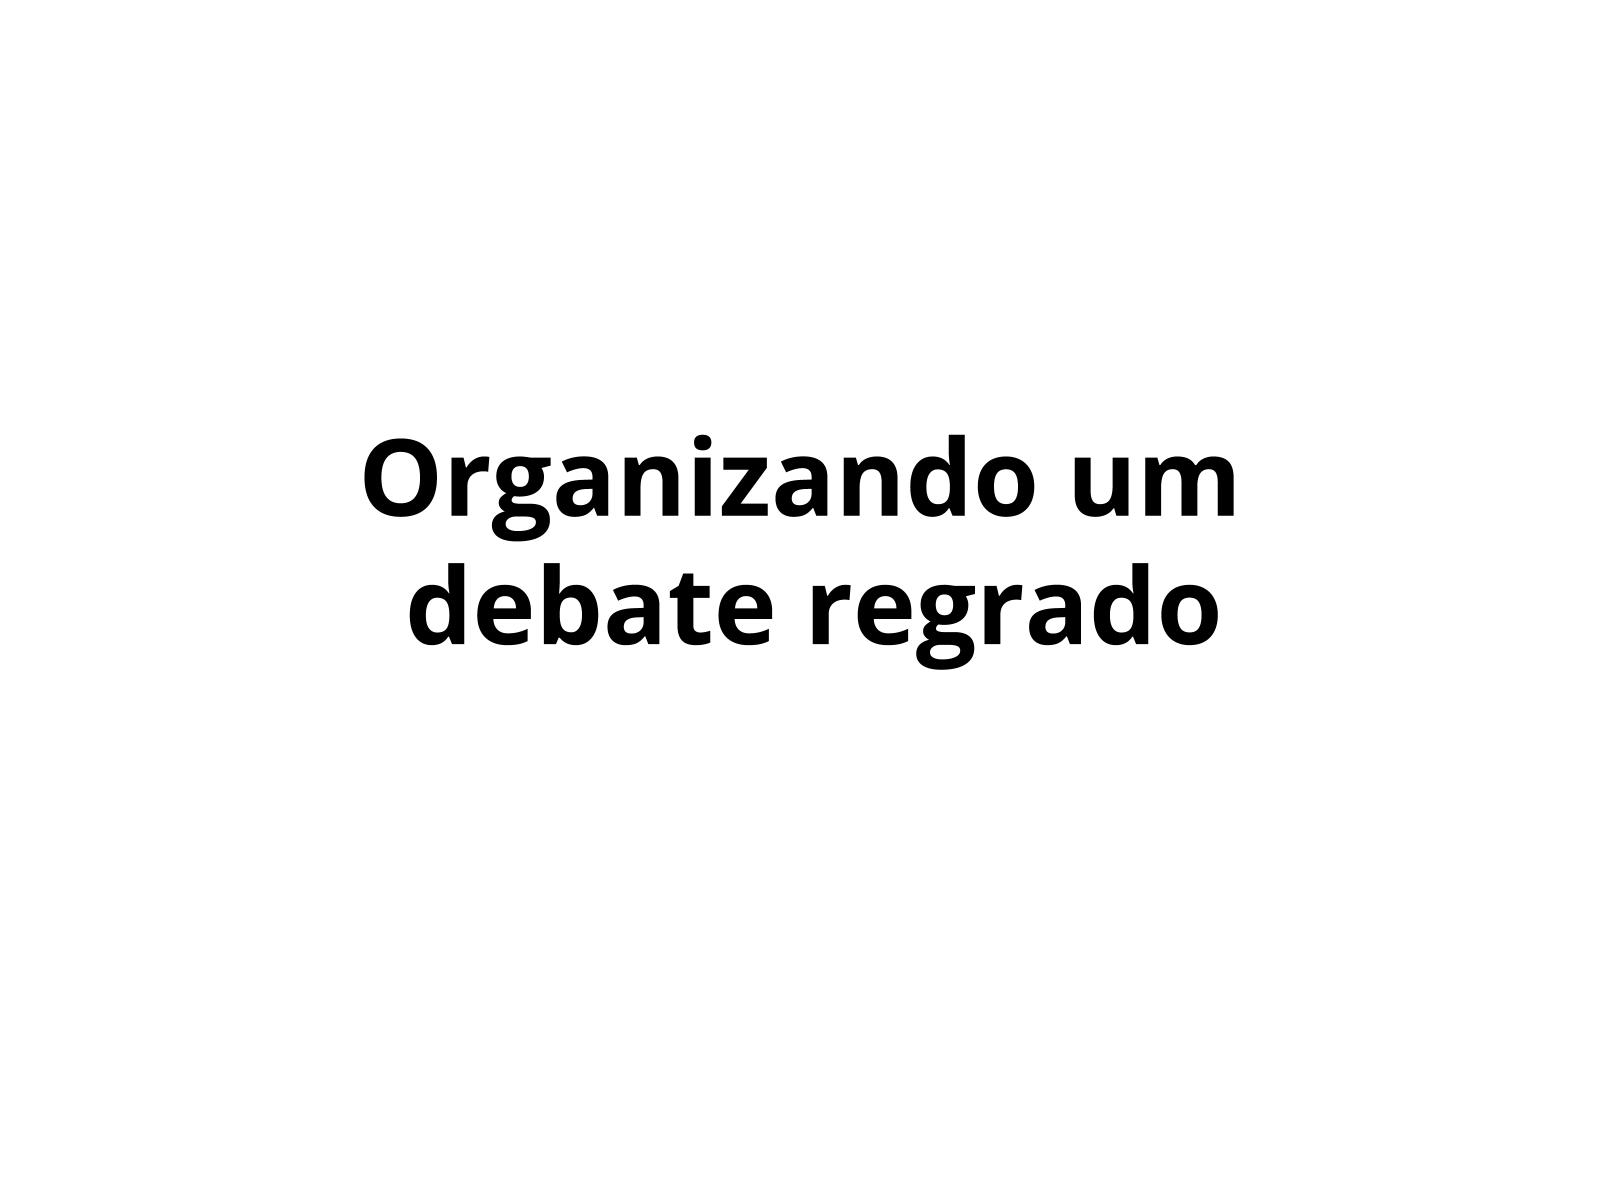 O debate em sala de aula: discutir X opinar X argumentar